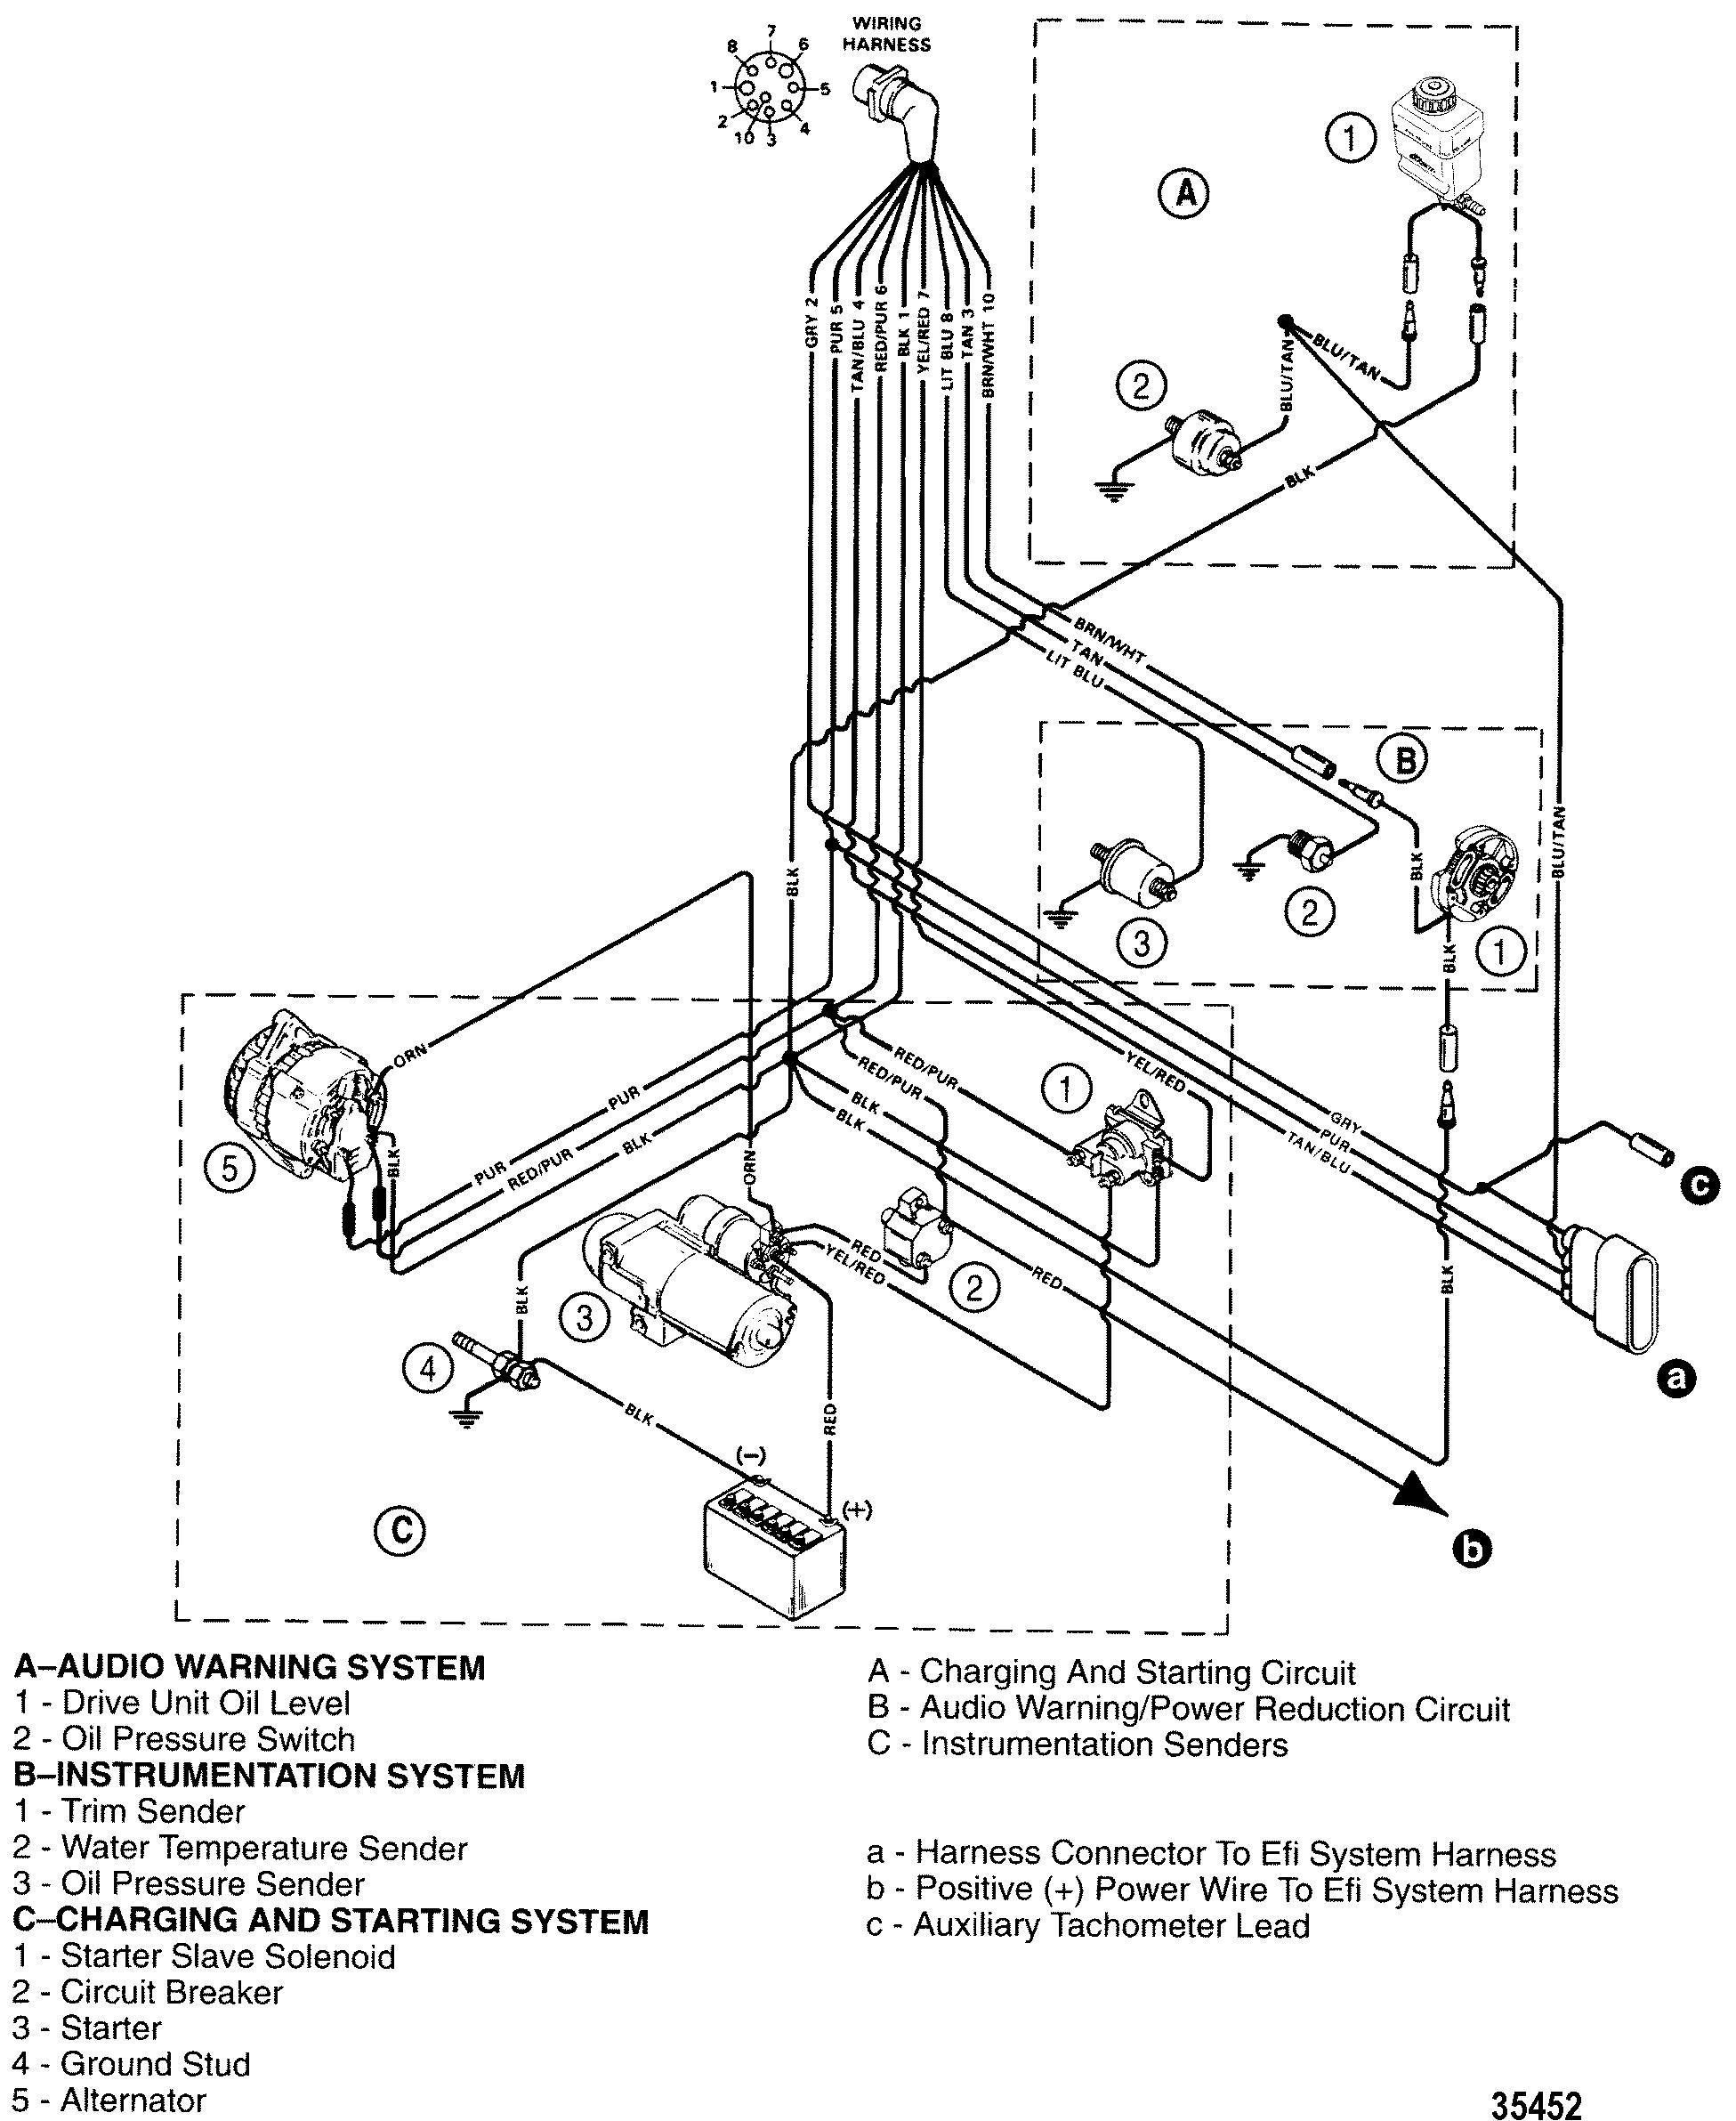 alternator wiring diagram mercruiser trim solenoid wiring diagram